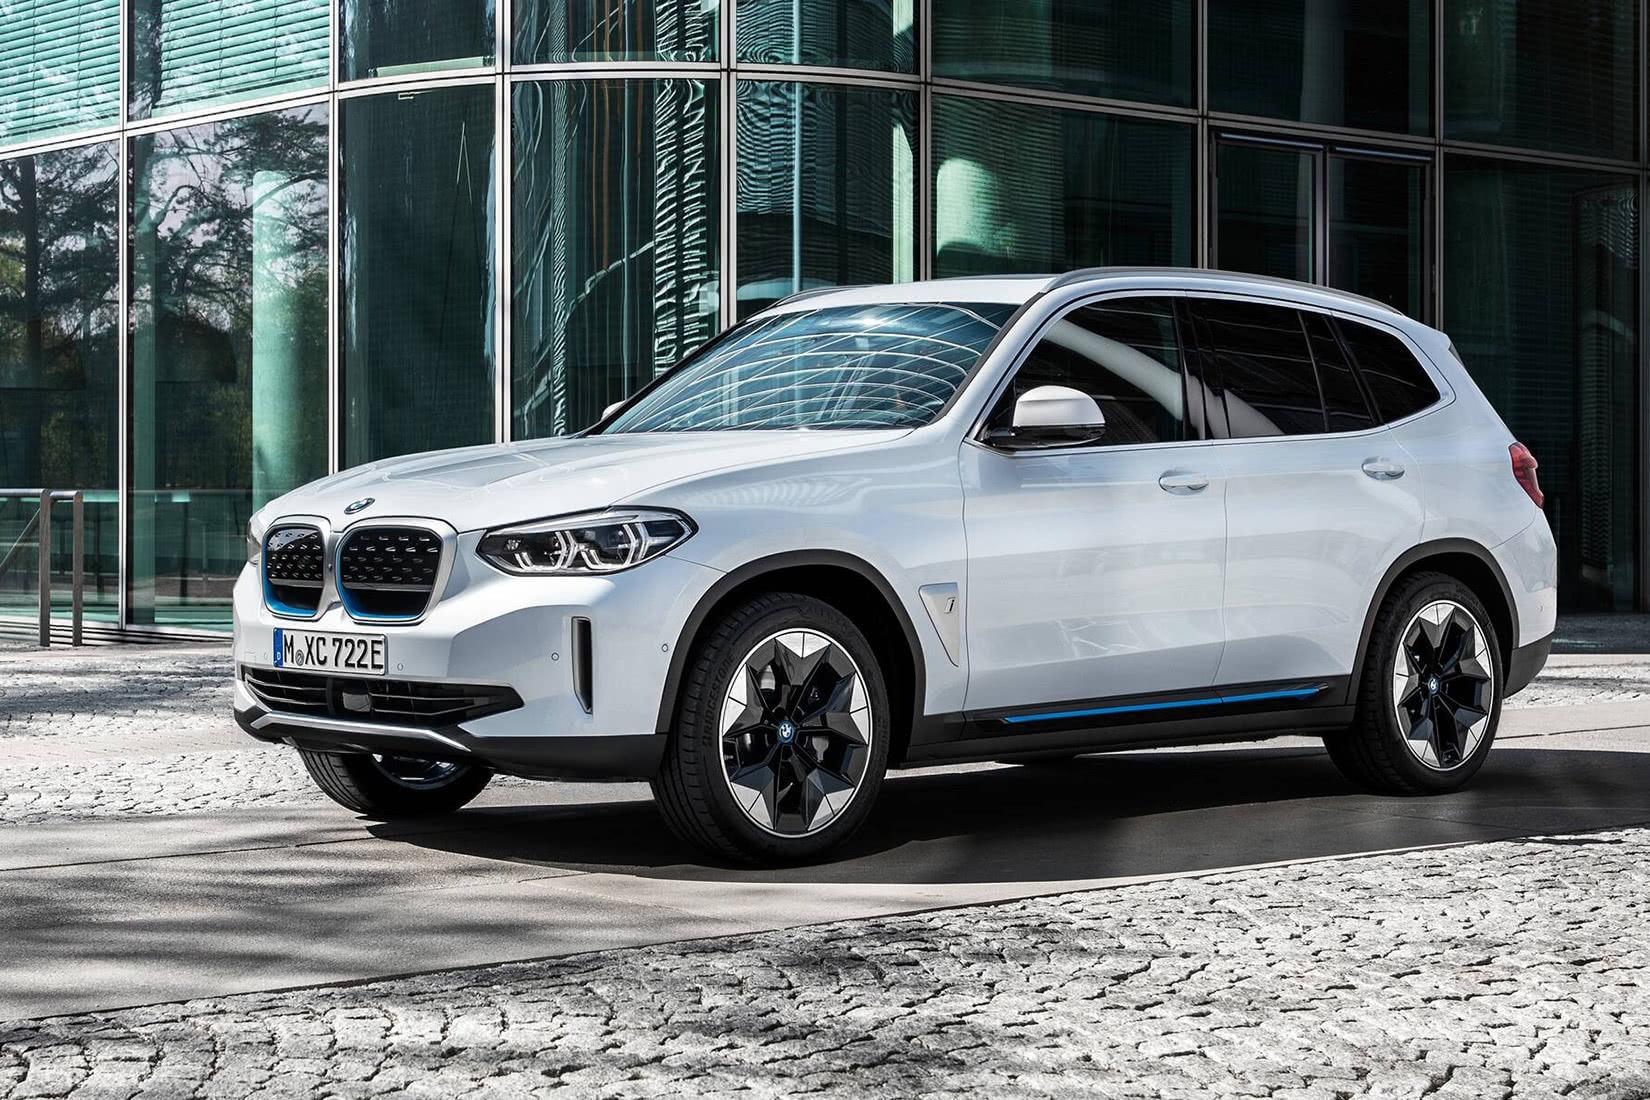 best luxury suv 2021 BMW iX3 - Luxe Digital